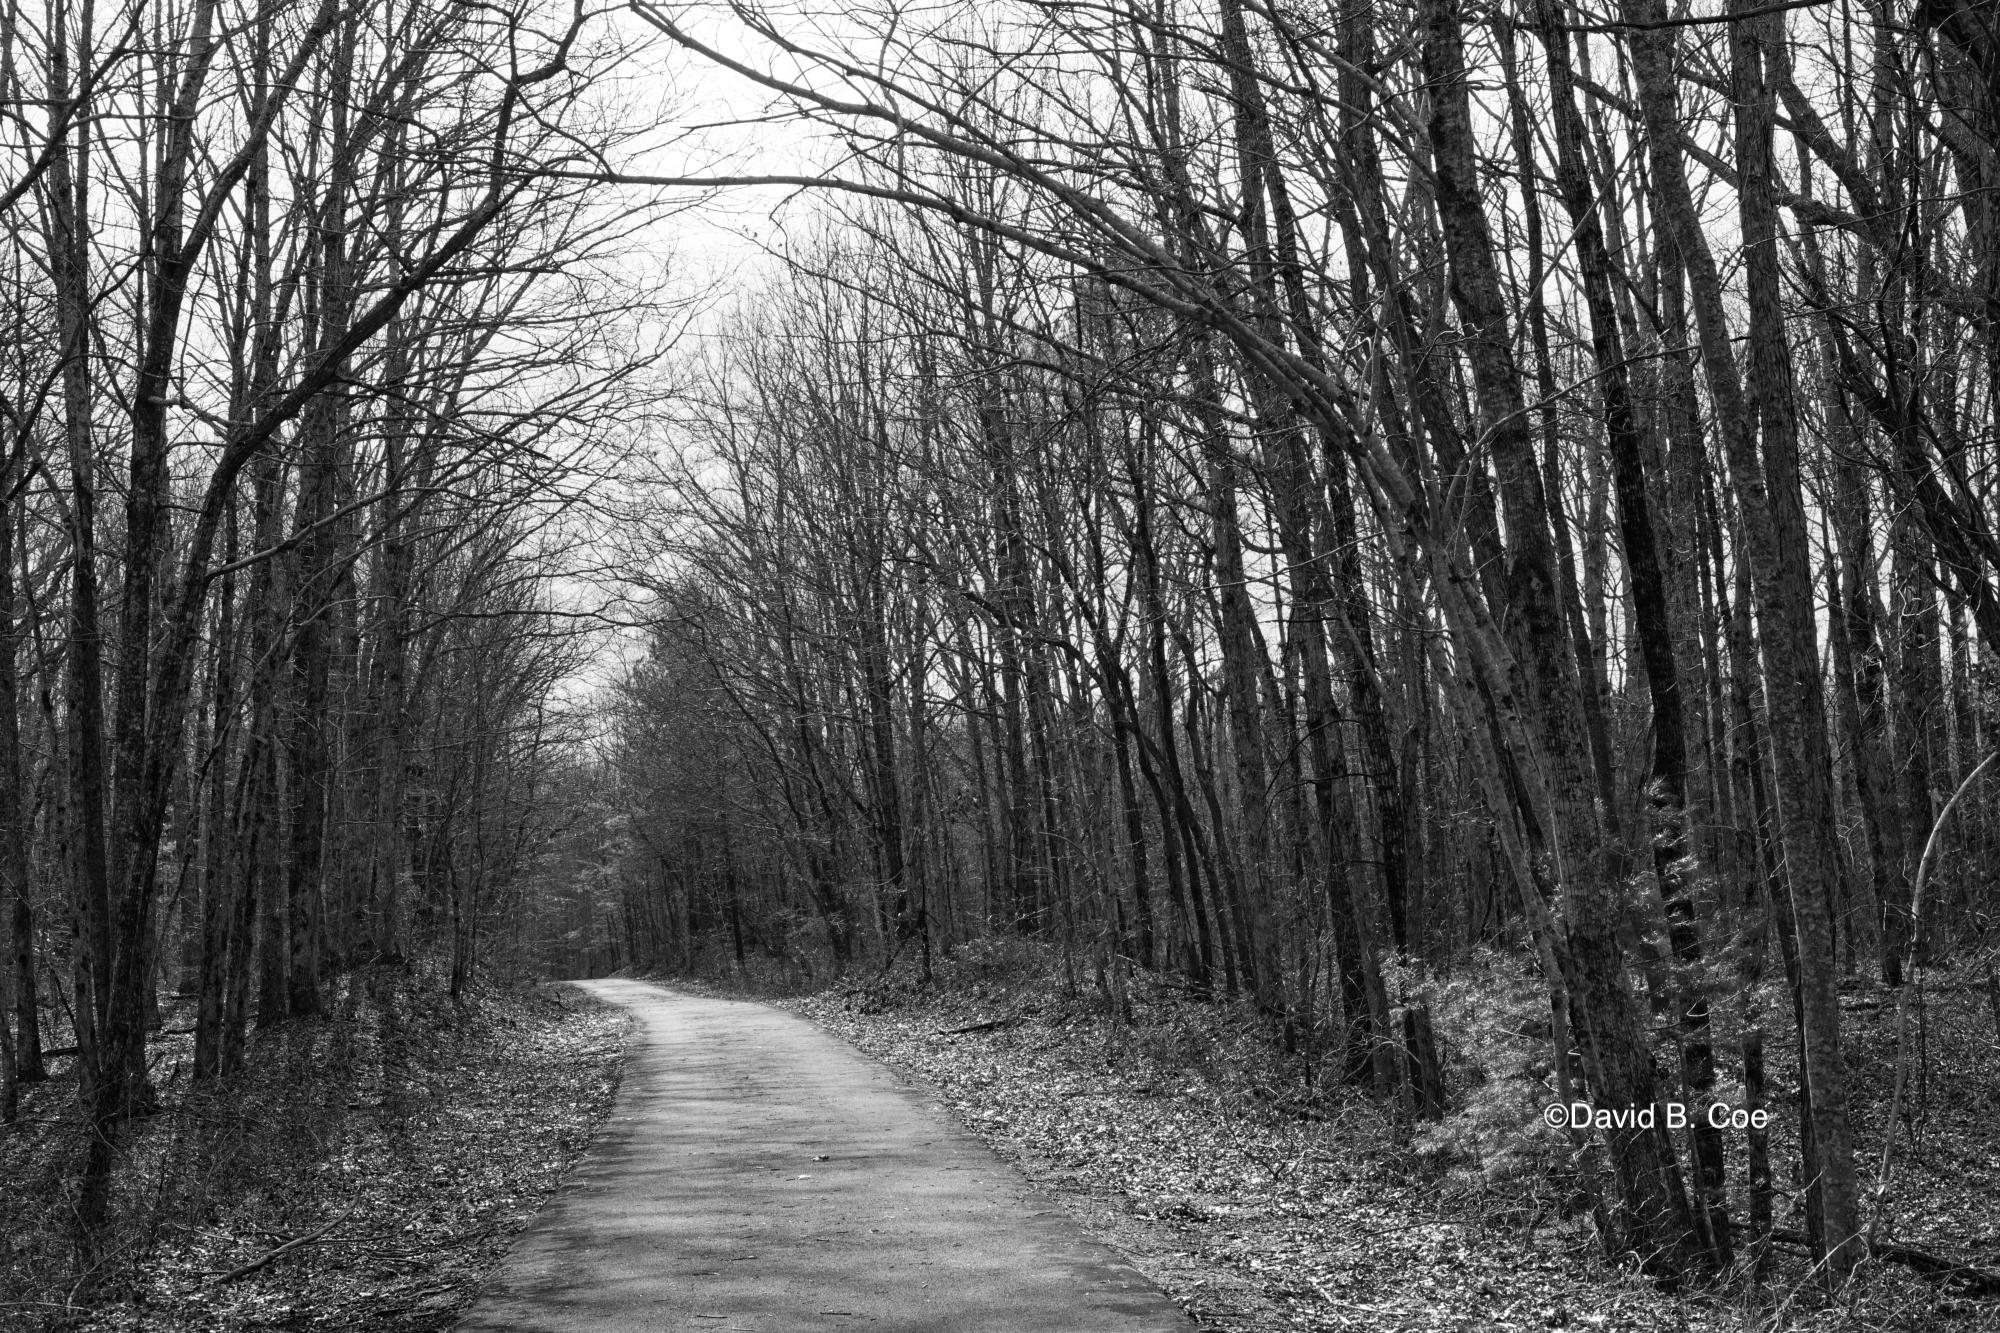 A Winter's Walk, by David B. Coe